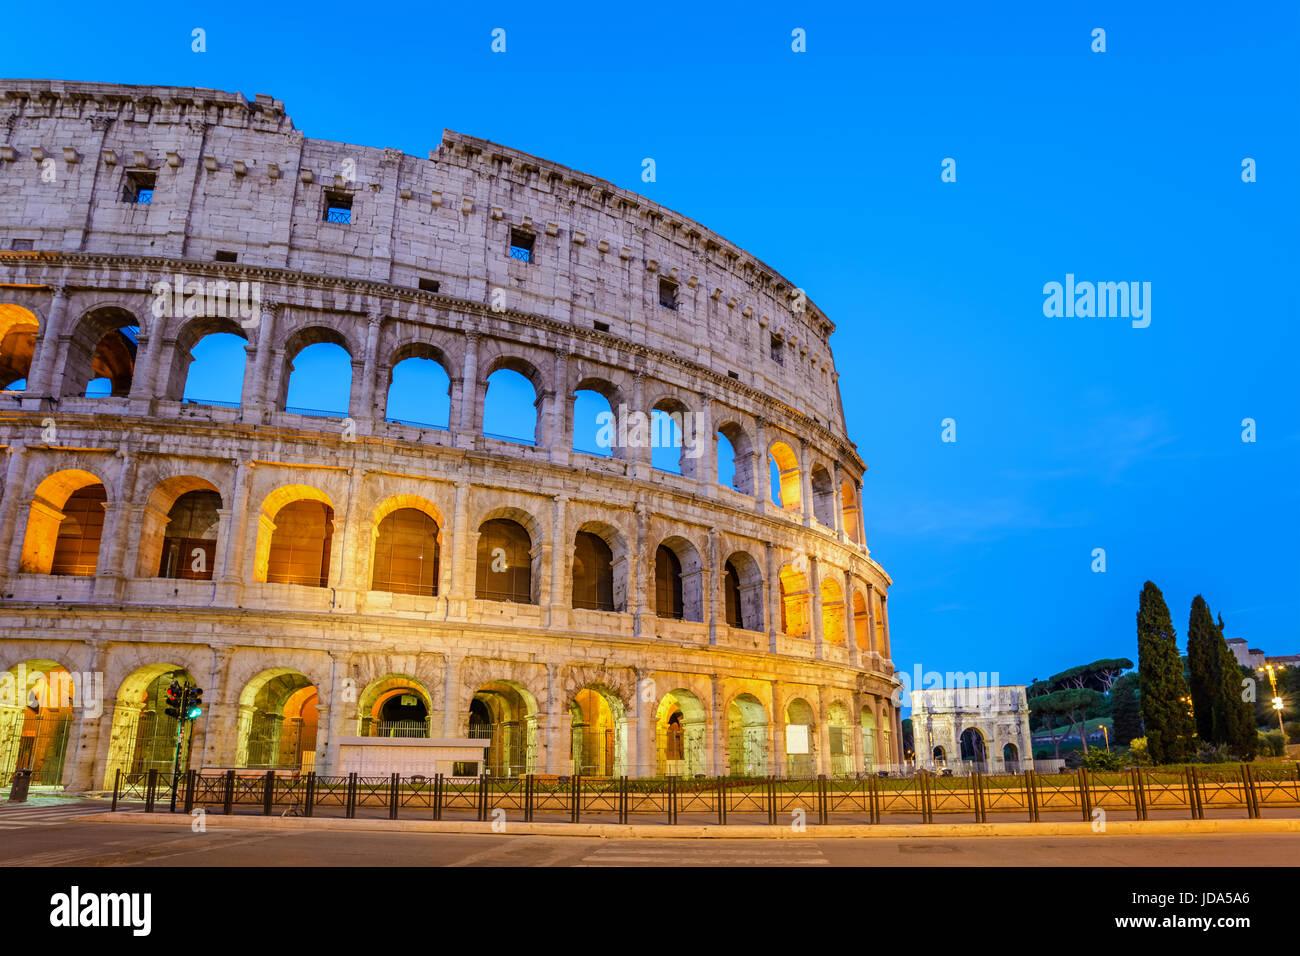 Rome Colosseum (Roma Coliseum) at night, Rome, Italy - Stock Image